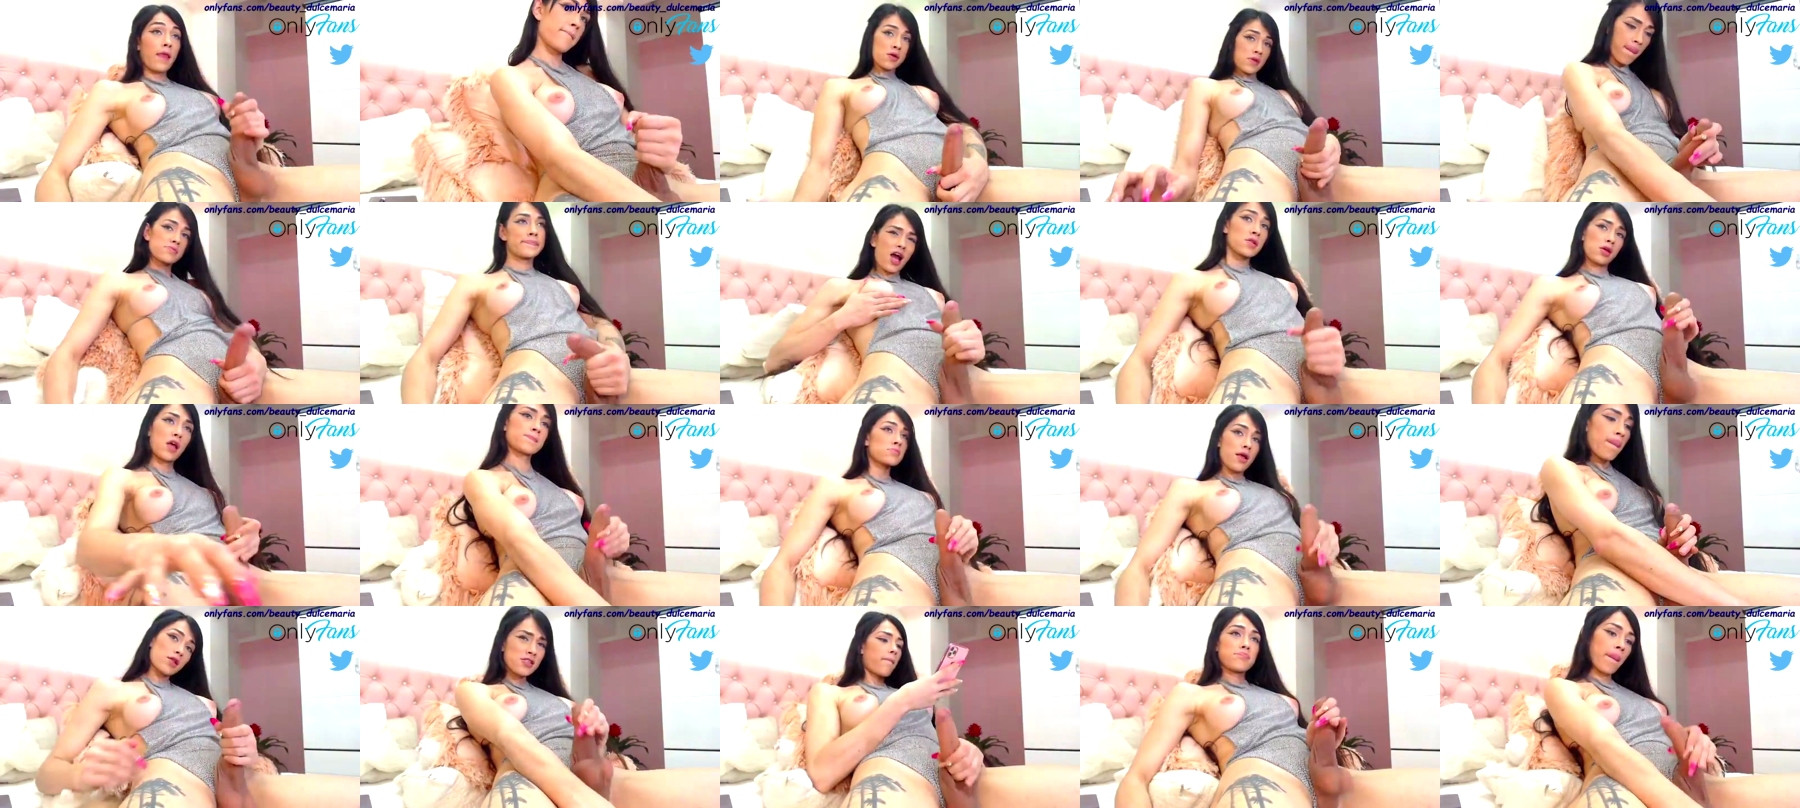 Beauty_Dulcemaria Video CAM SHOW @ Chaturbate 11-06-2021